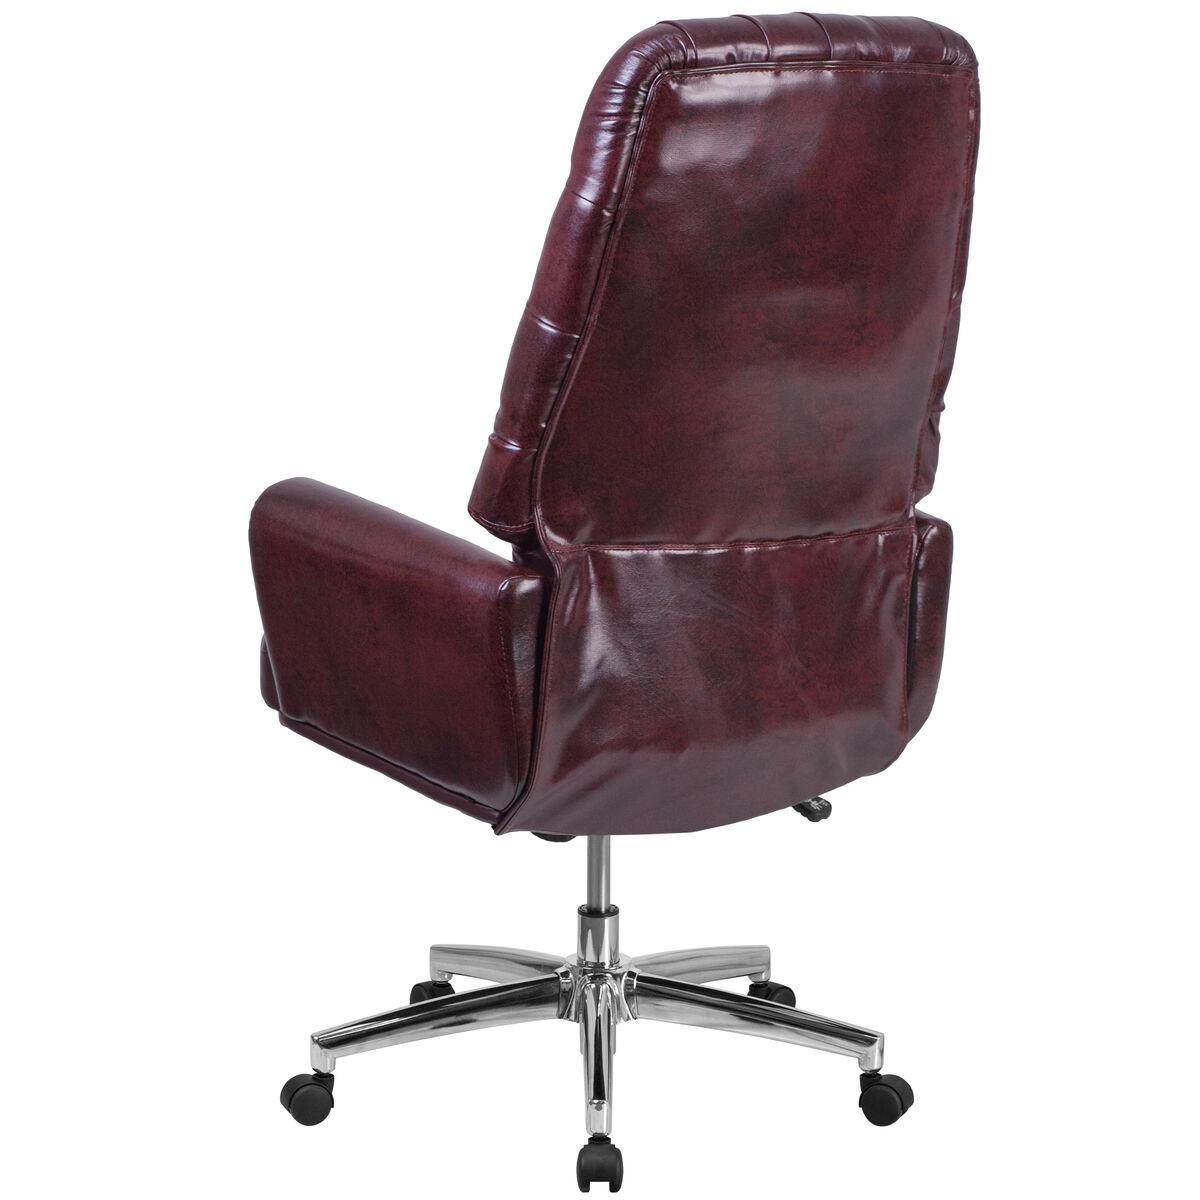 burgundy high back chair bt 444 by gg bizchair com